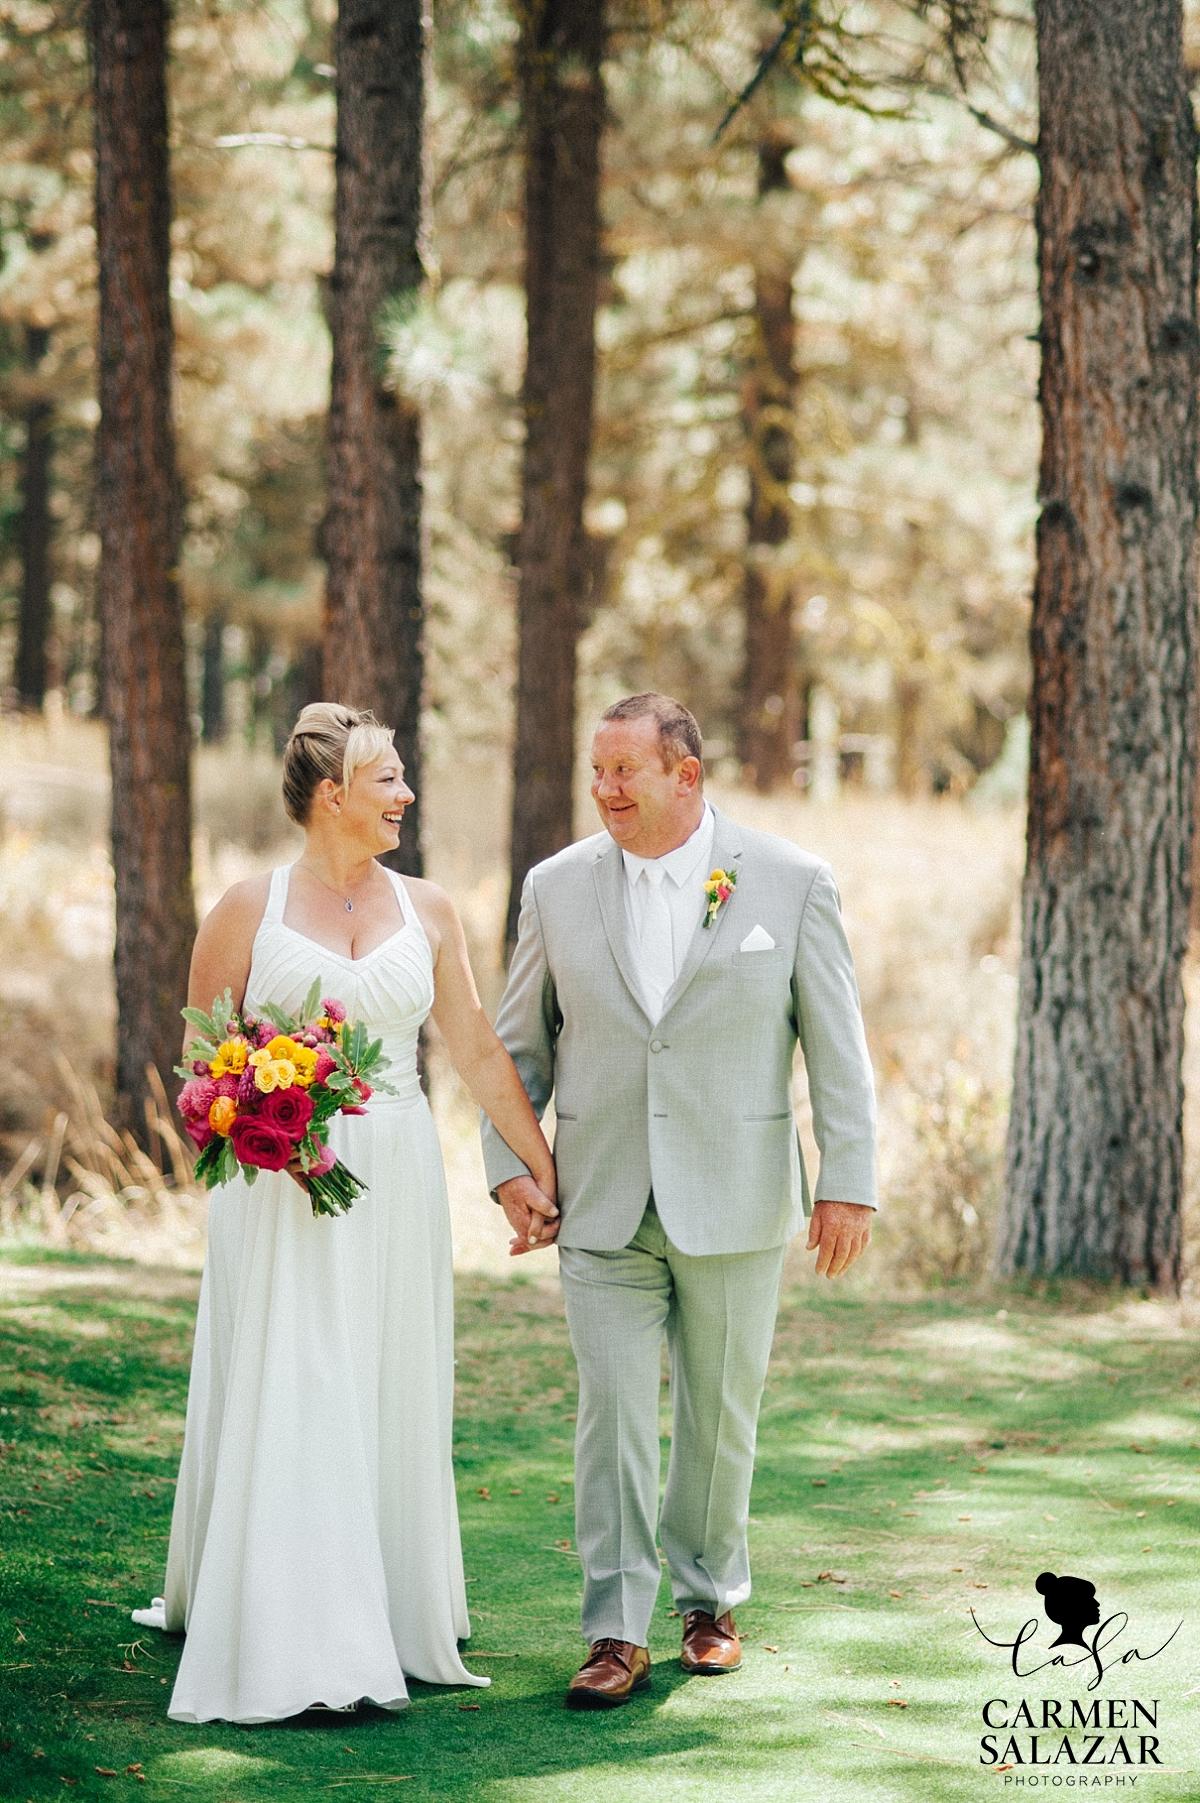 Chalet View Lodge DIY summer wedding - Carmen Salazar